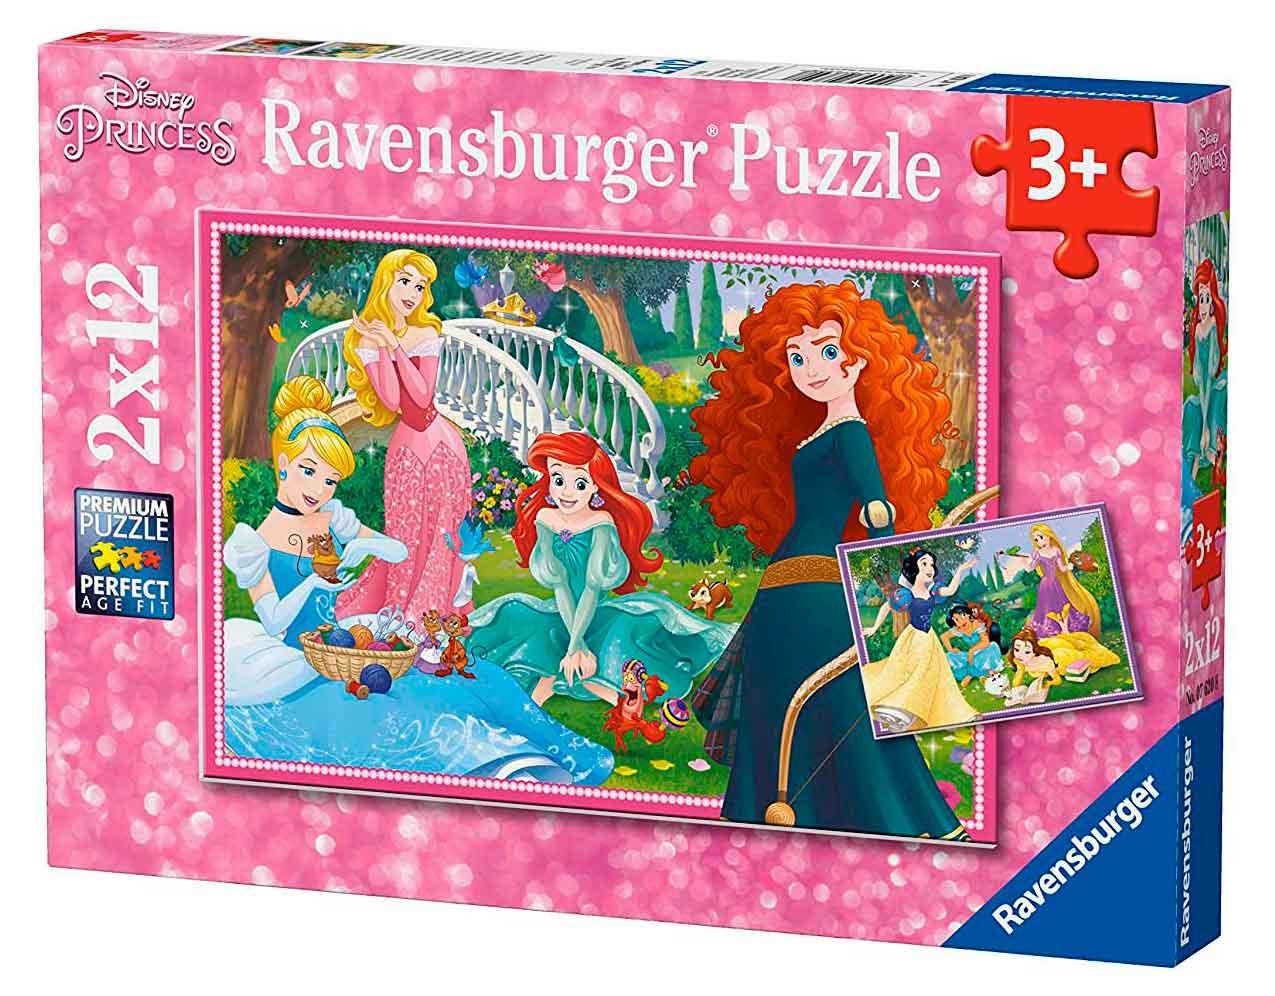 Puzzle Ravensburger Princesas Disney de 2x12 Piezas